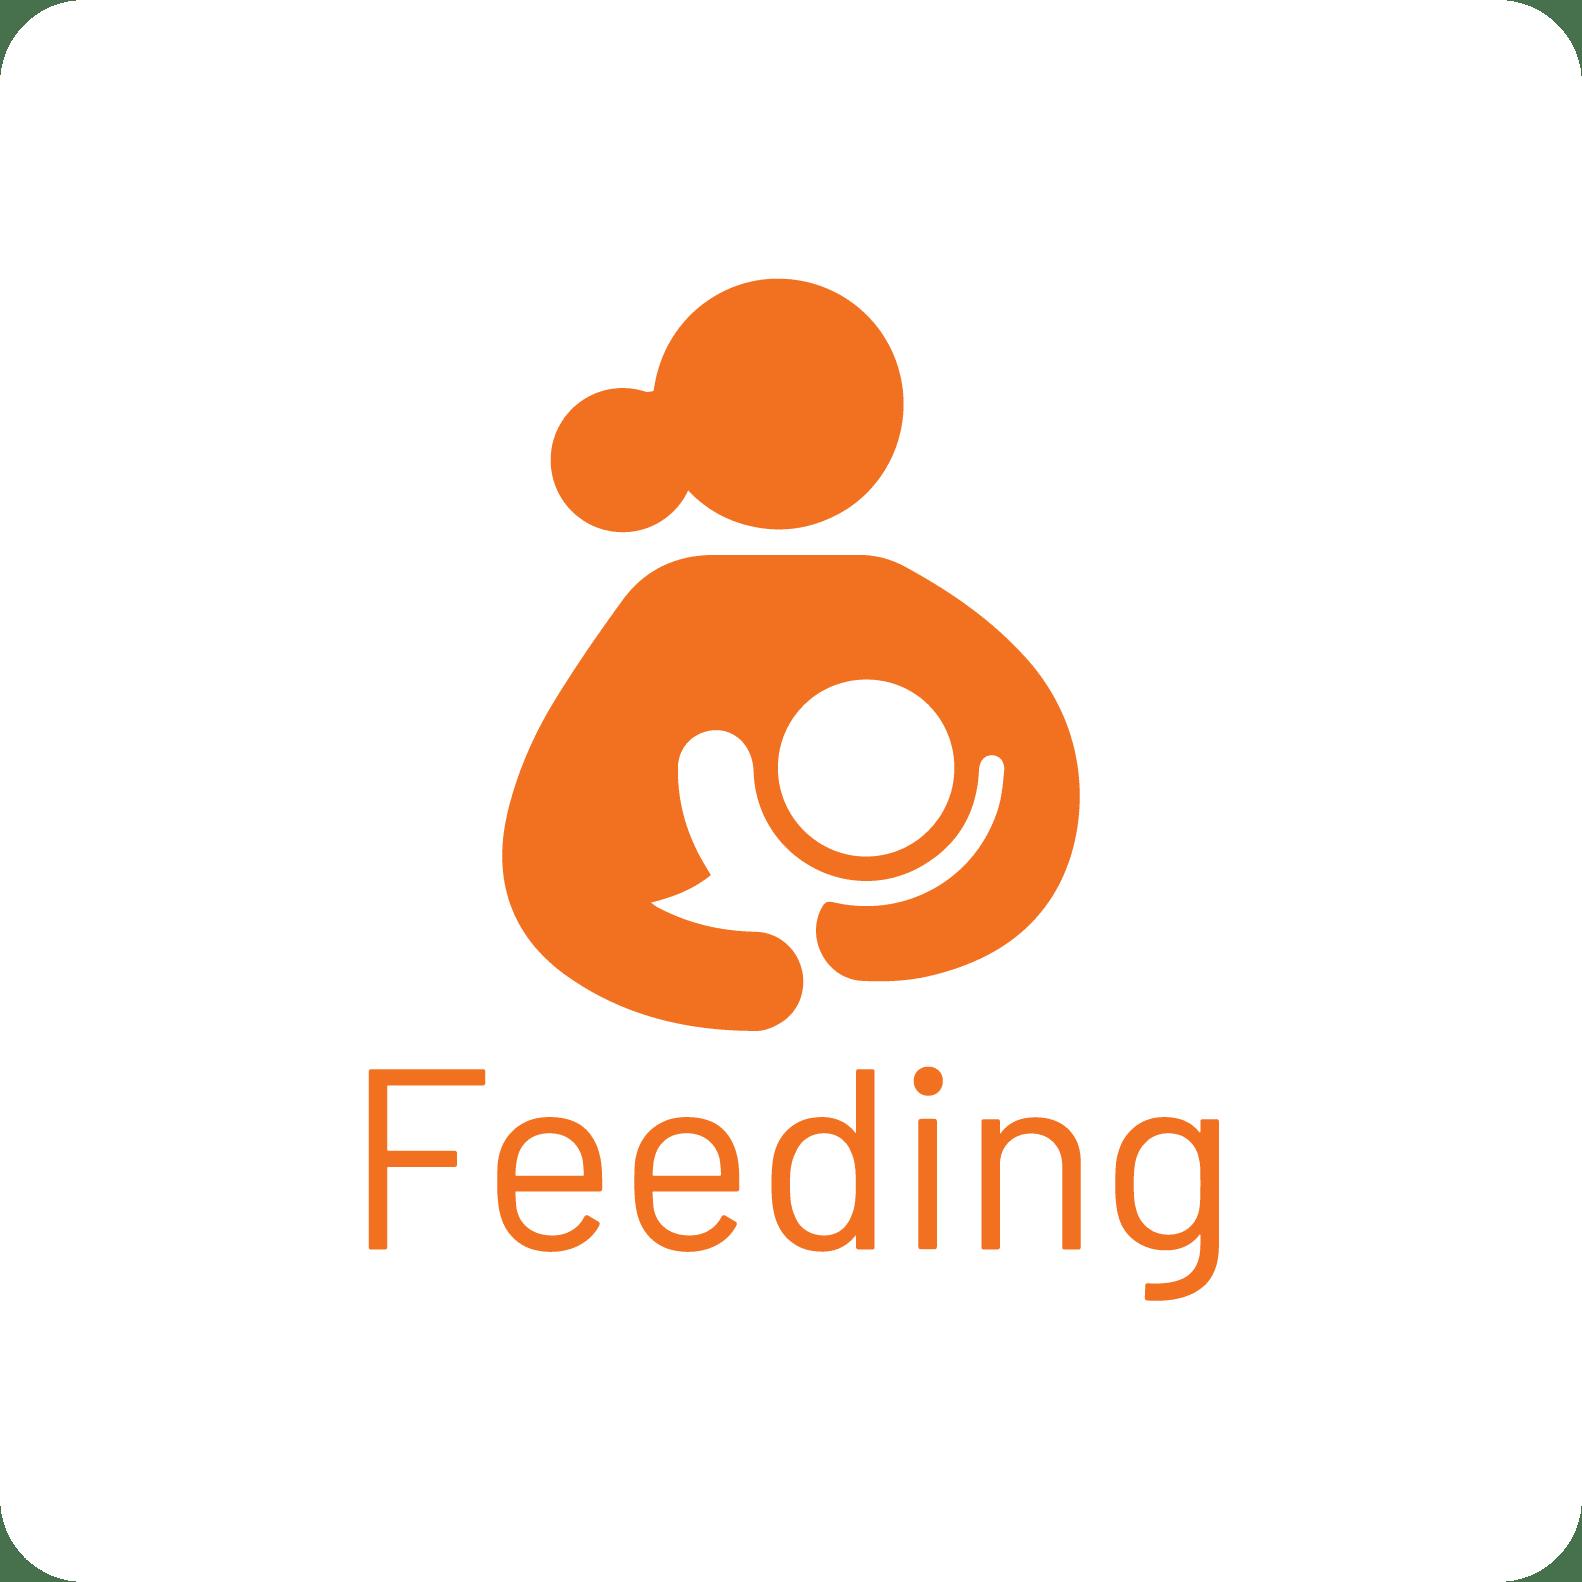 Image for feeding category